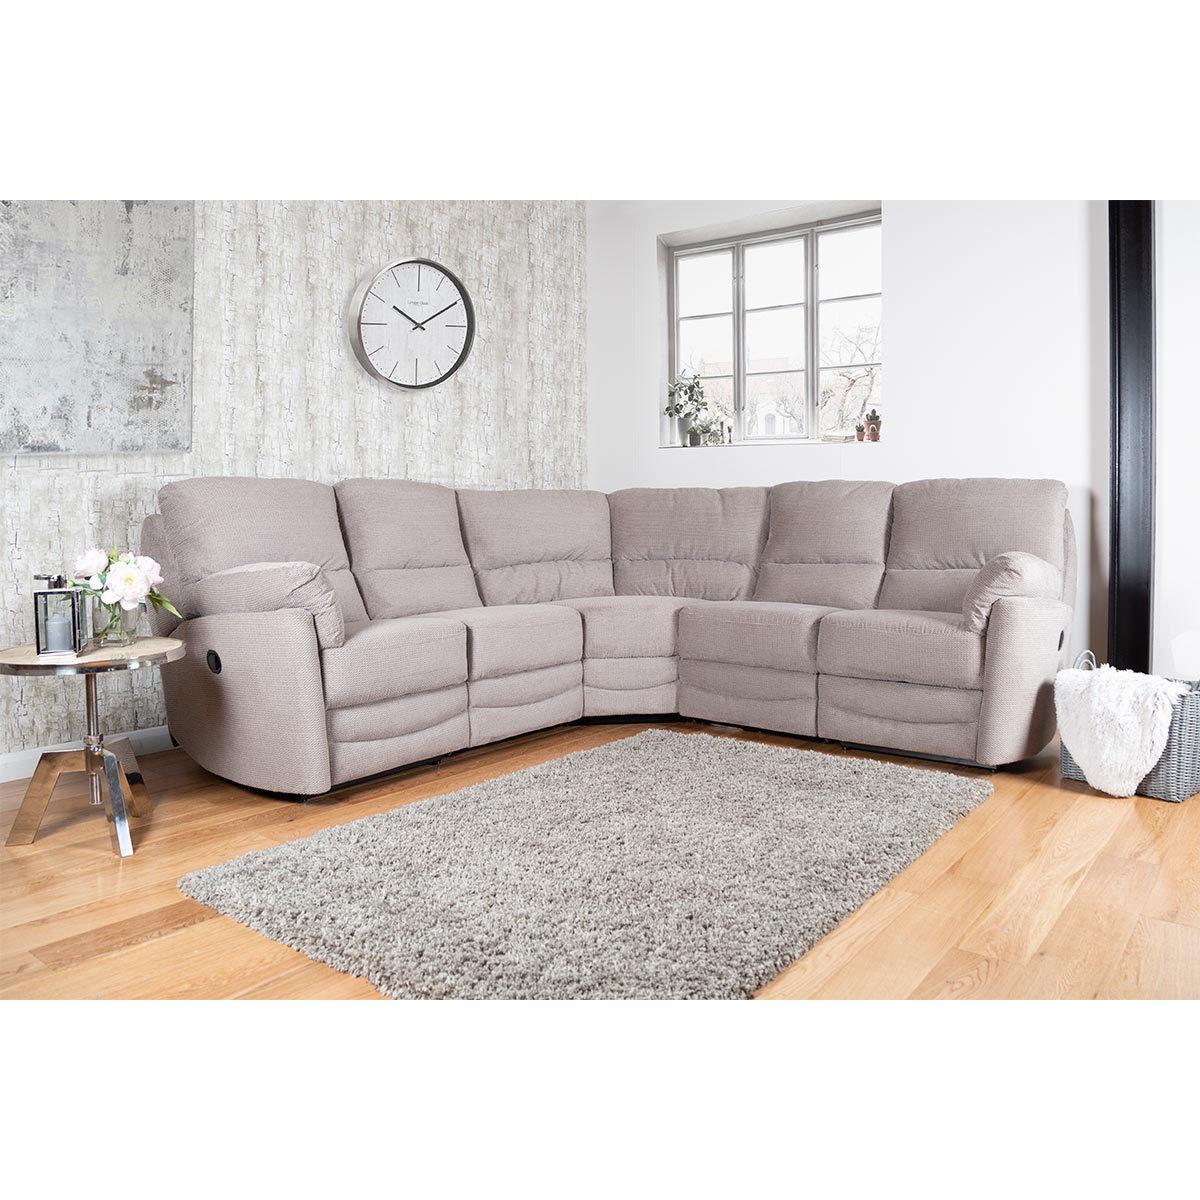 Minster Fabric Power Recliner Corner Sofa In Rich Mink Costco Uk